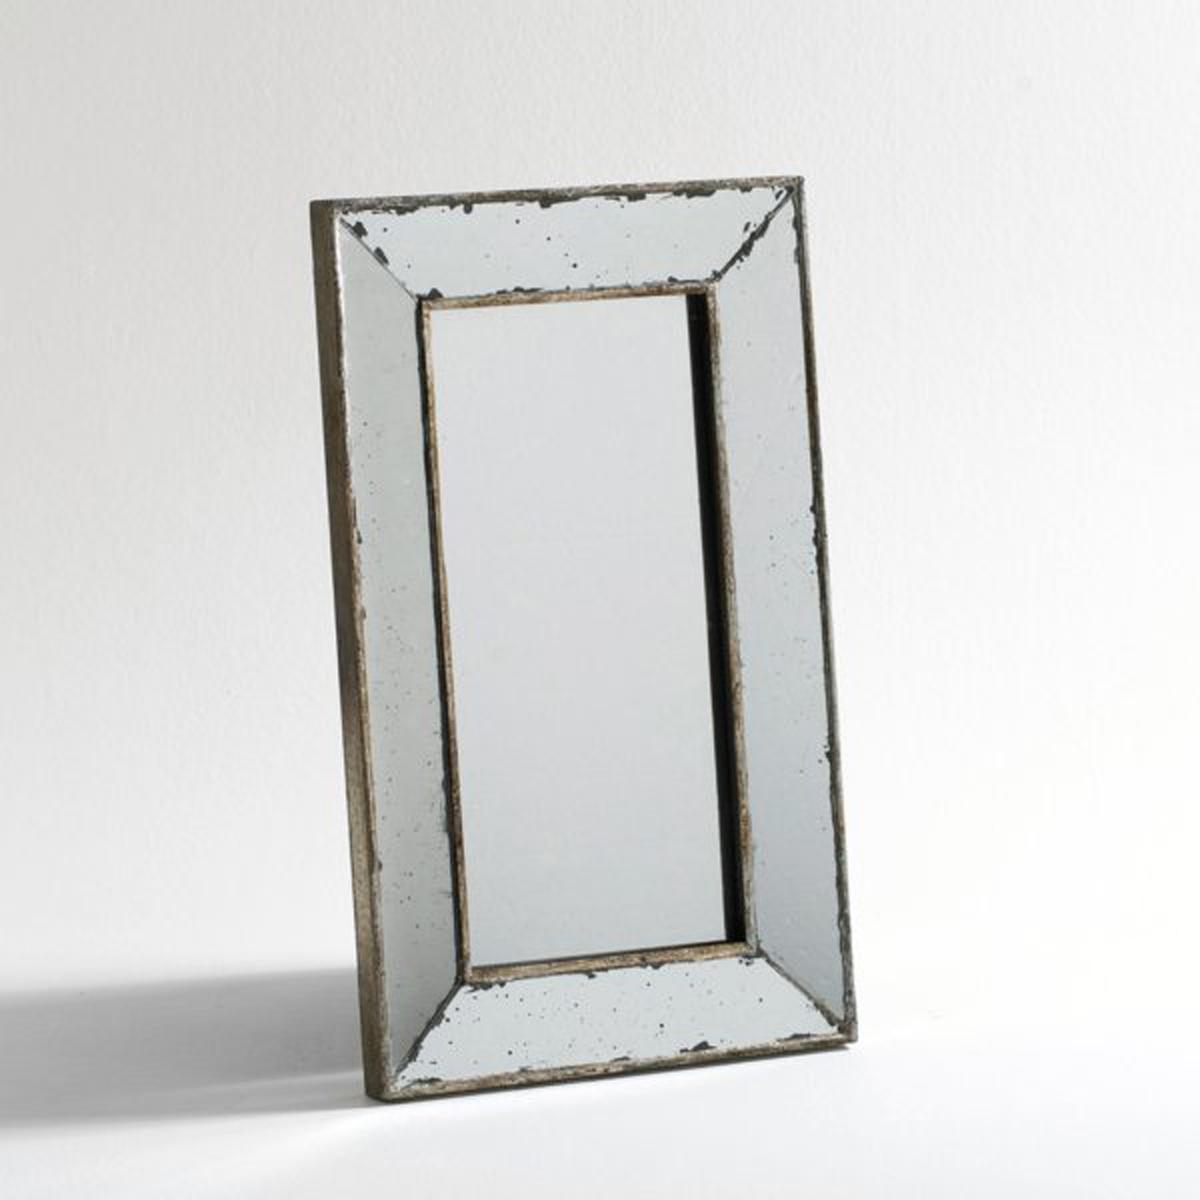 Зеркало в ретро-стиле, средняя модель Д31 x В51 см, EdwinРазмеры  :Д.31 x В.51 x Г.3 см..<br><br>Цвет: серый серебристый